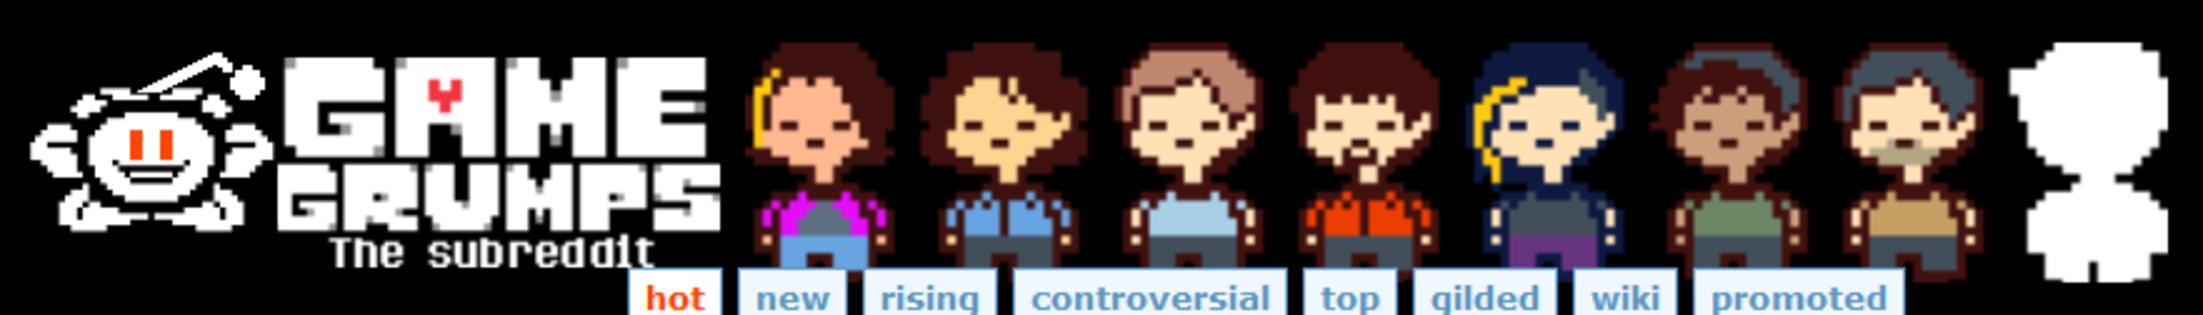 R Gamegrumps Header Undertale Know Your Meme